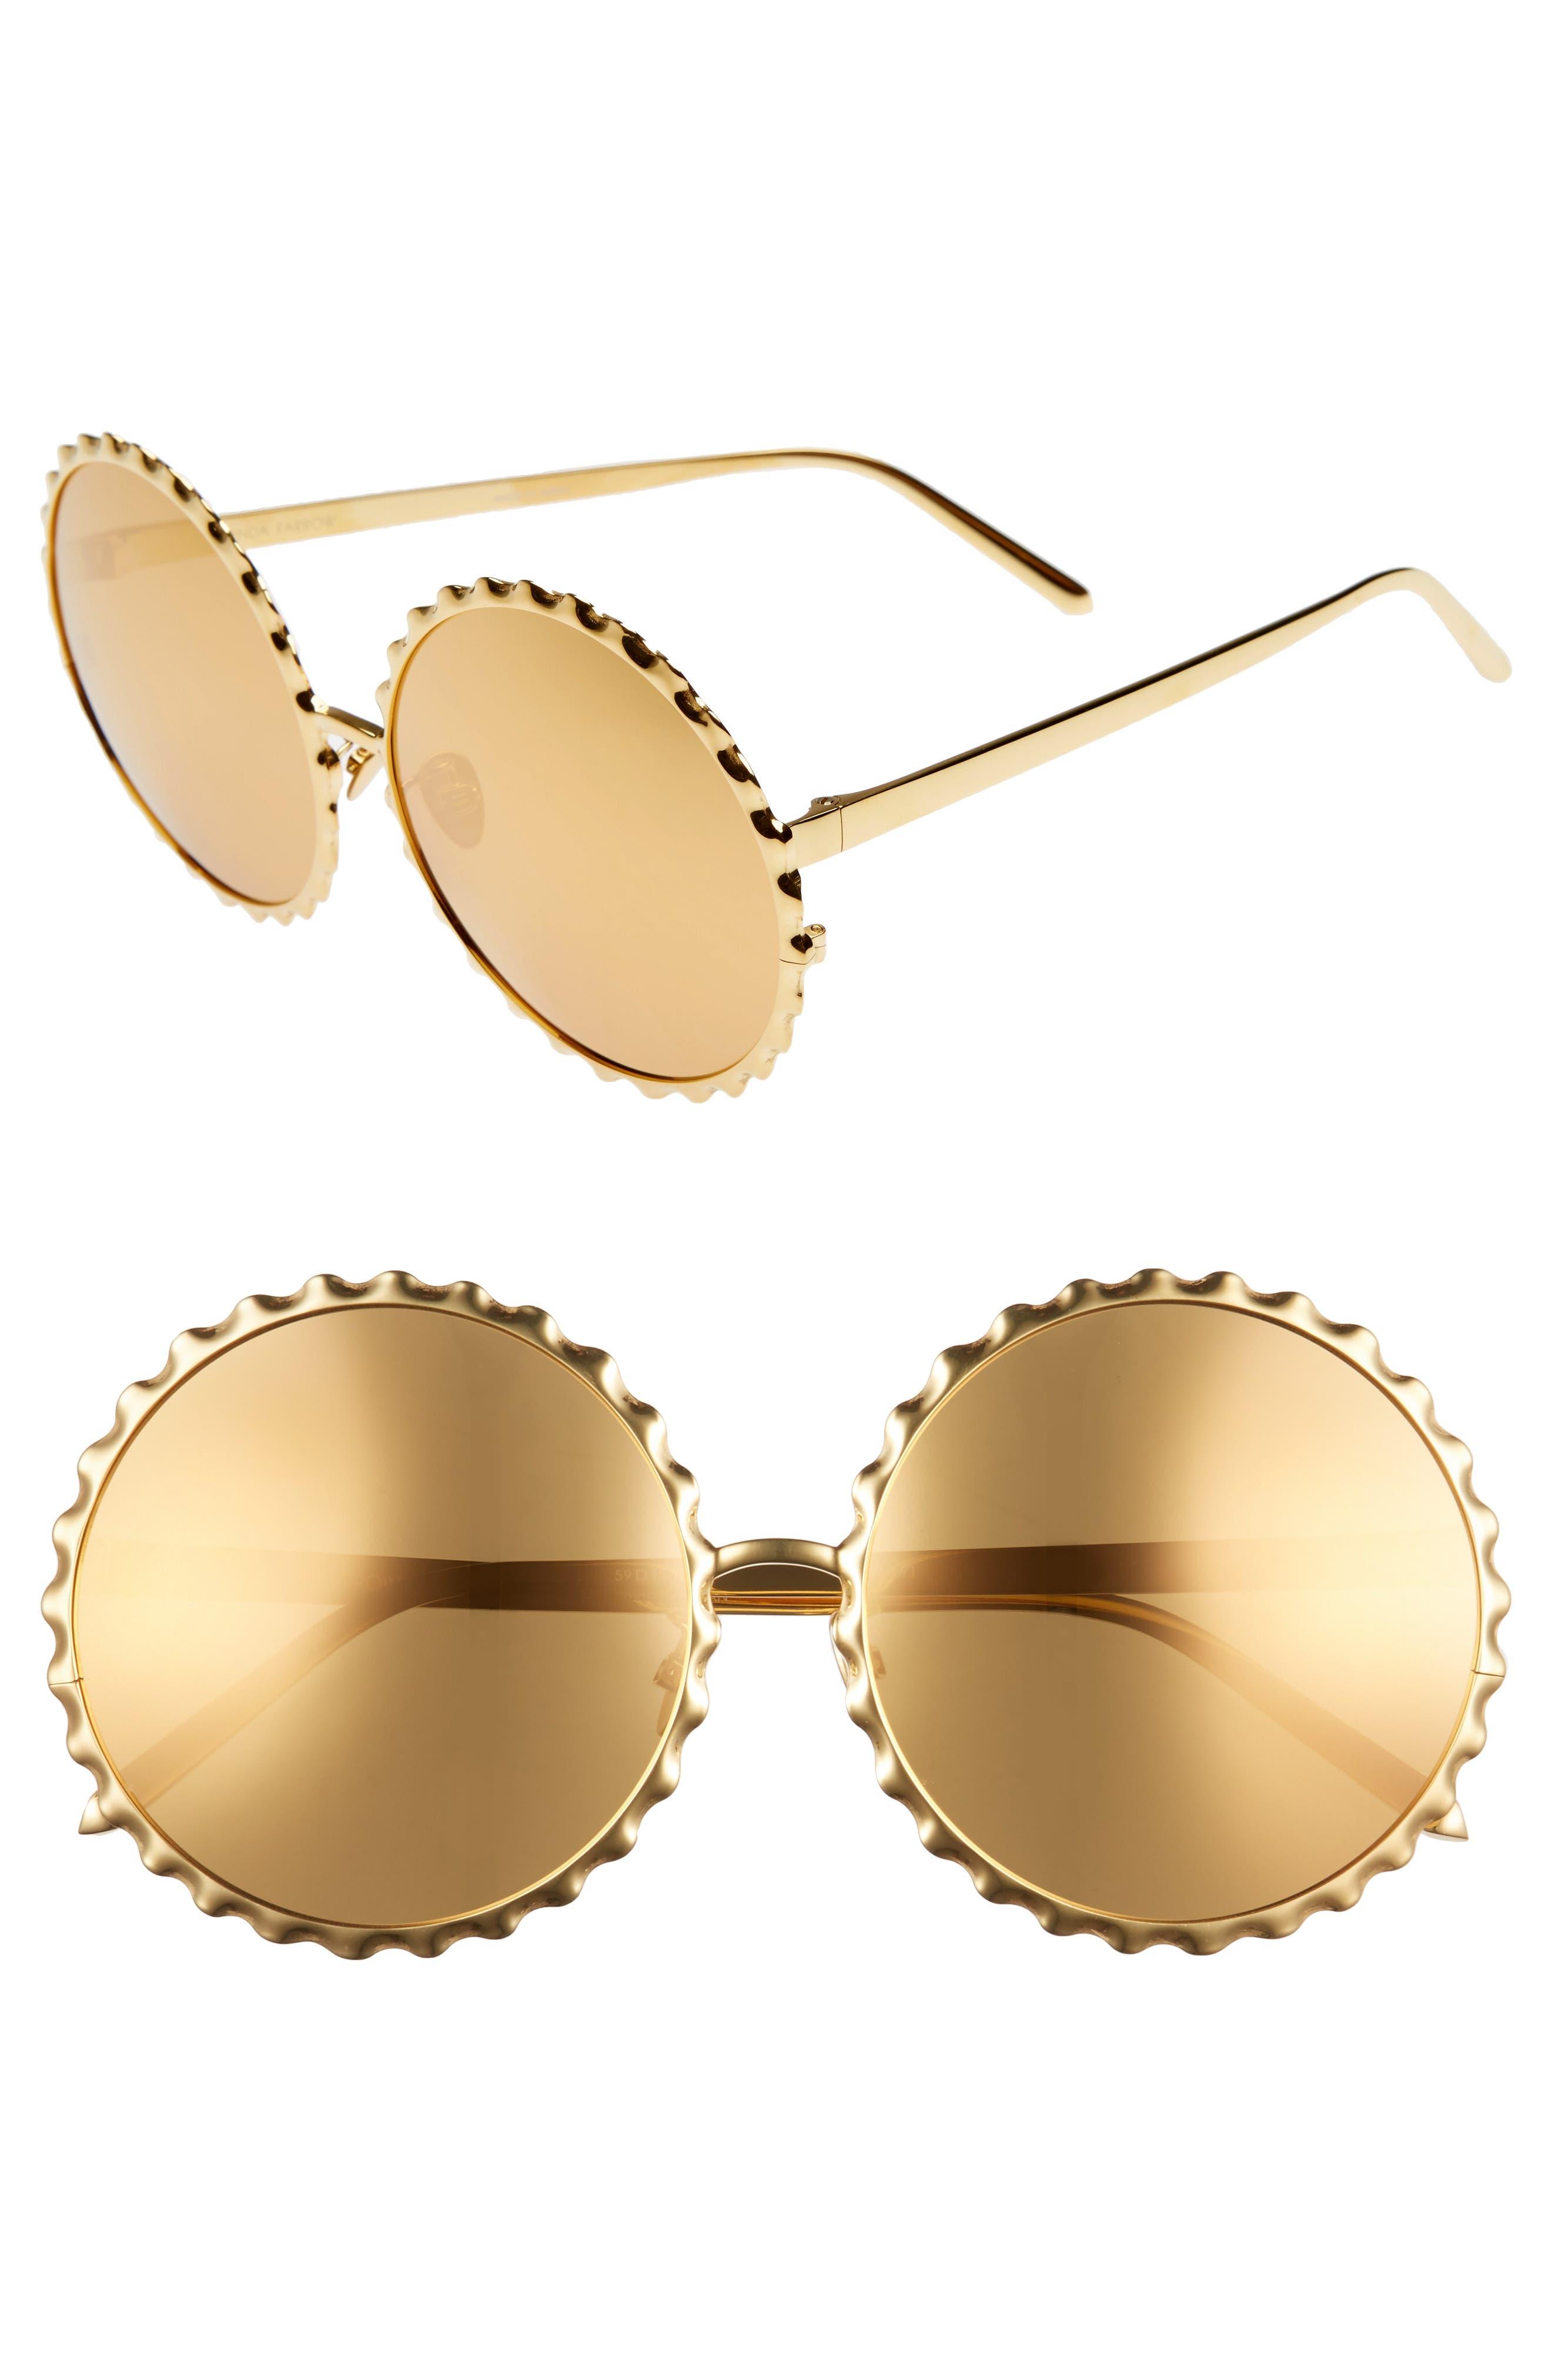 59mm Mirrored 18 Karat Gold Trim Round Sunglasses,                         Main,                         color, Yellow Gold/ Gold